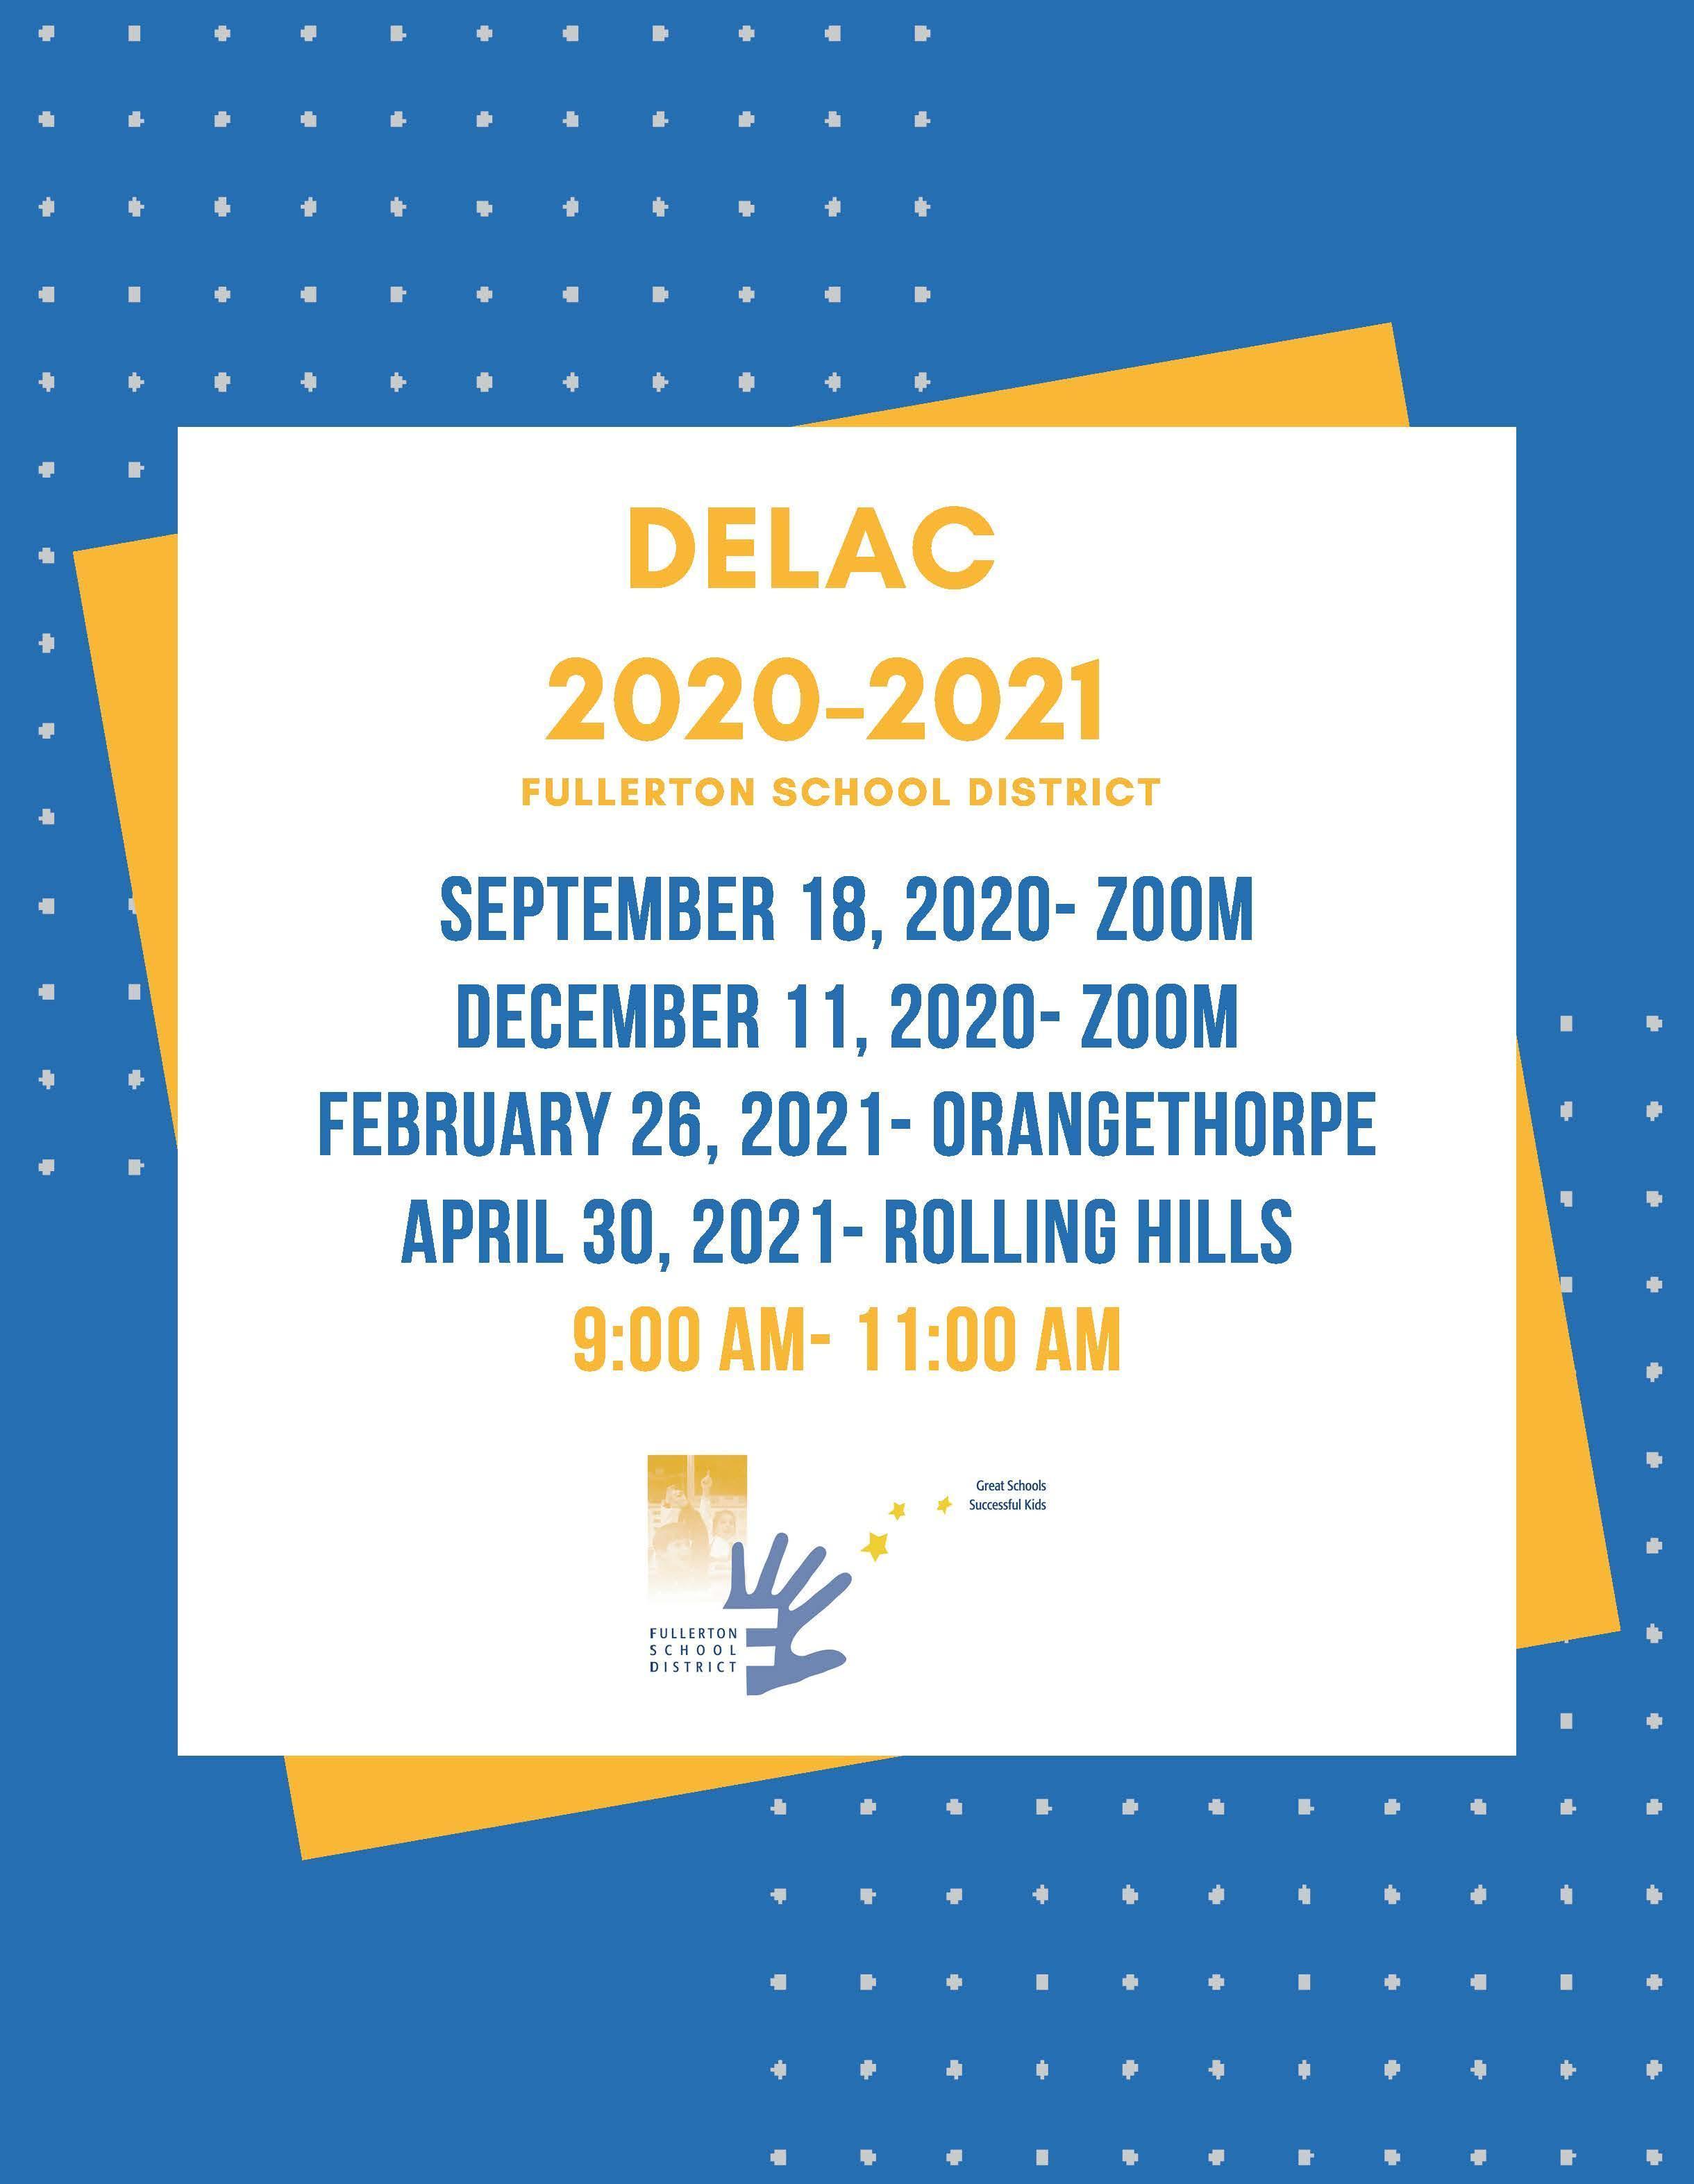 DELAC 20-21 Dates English